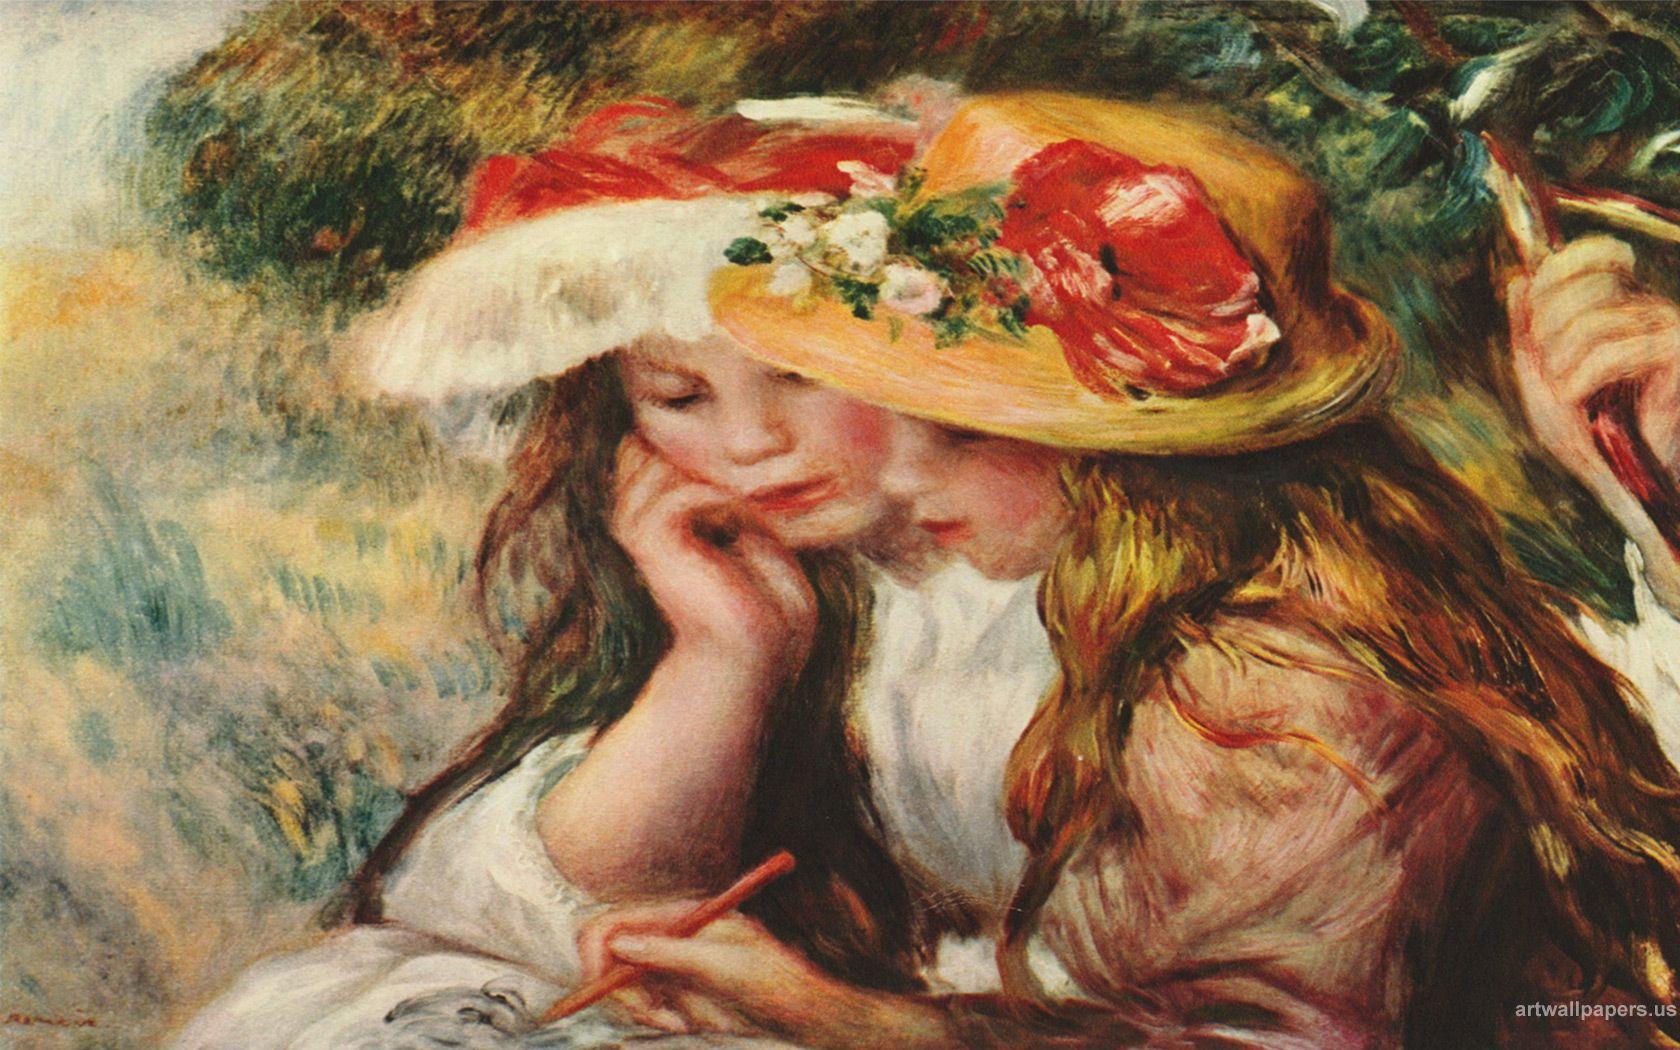 1680x1050 Renoir Pierre Auguste hình nền